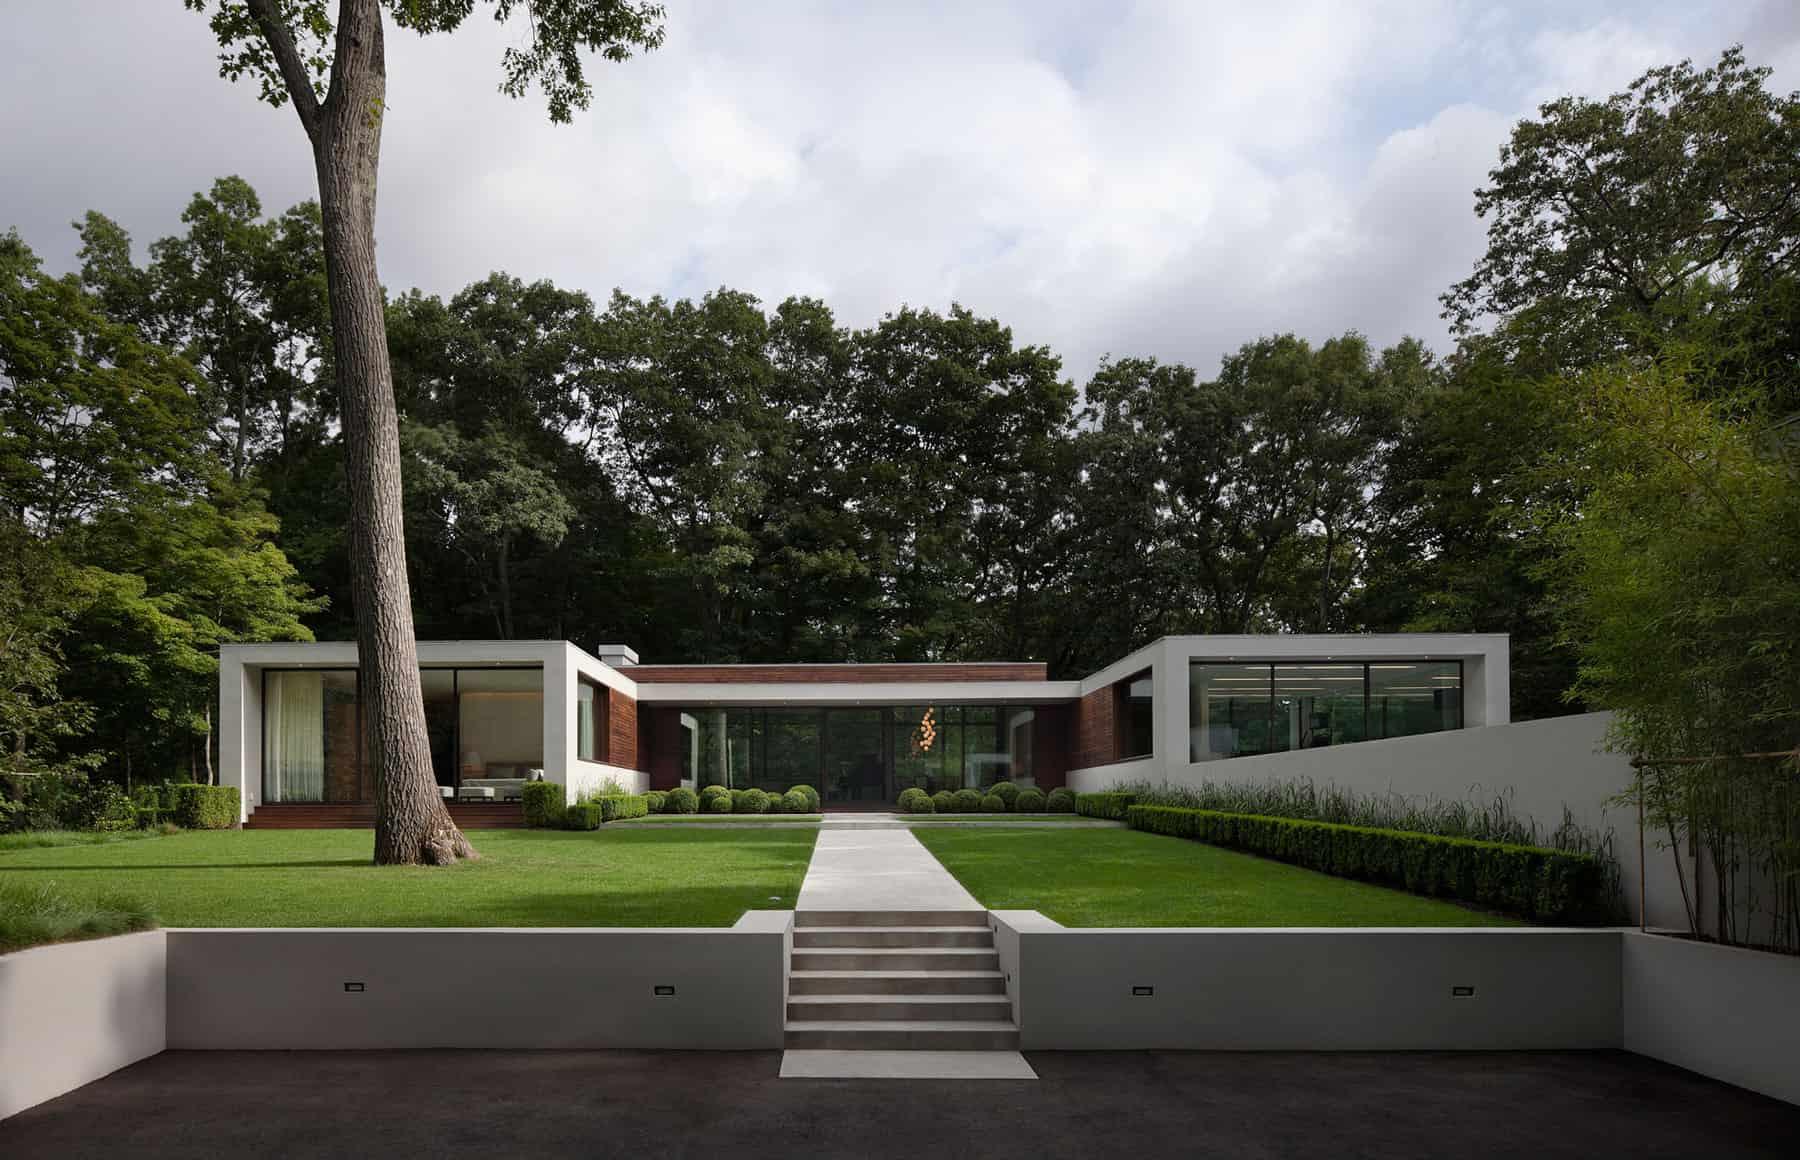 New Canaan Residence by Specht Harpman